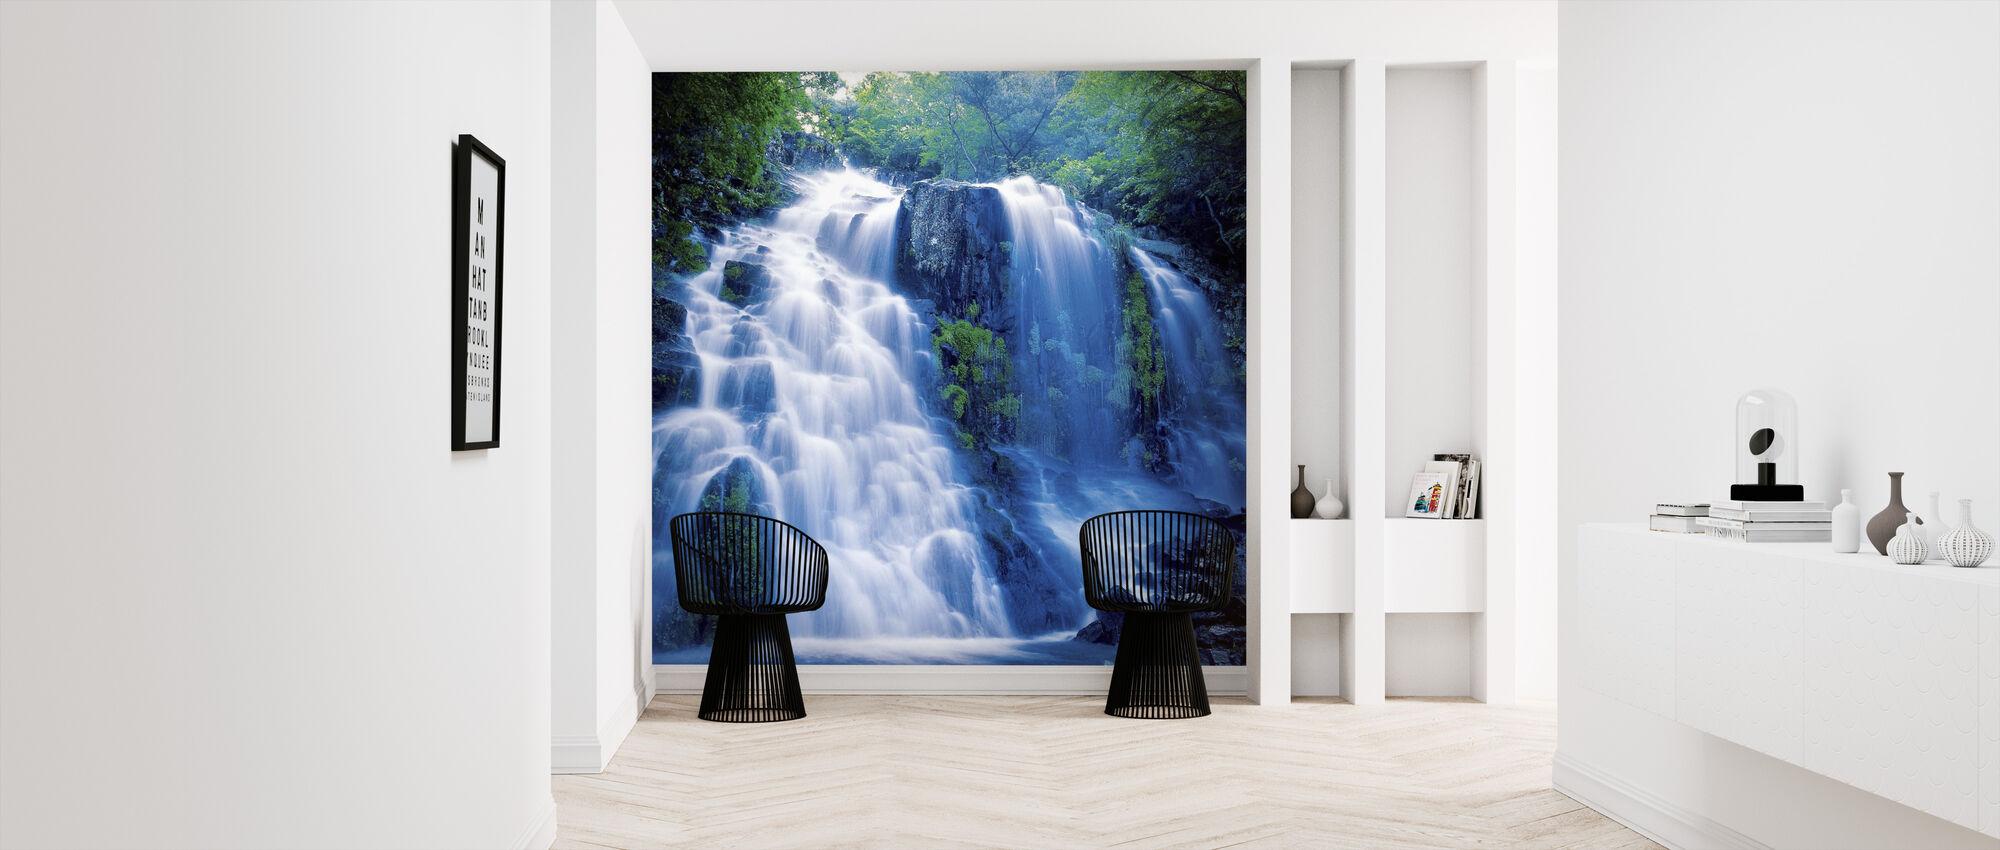 Nature Scenery - Wallpaper - Hallway